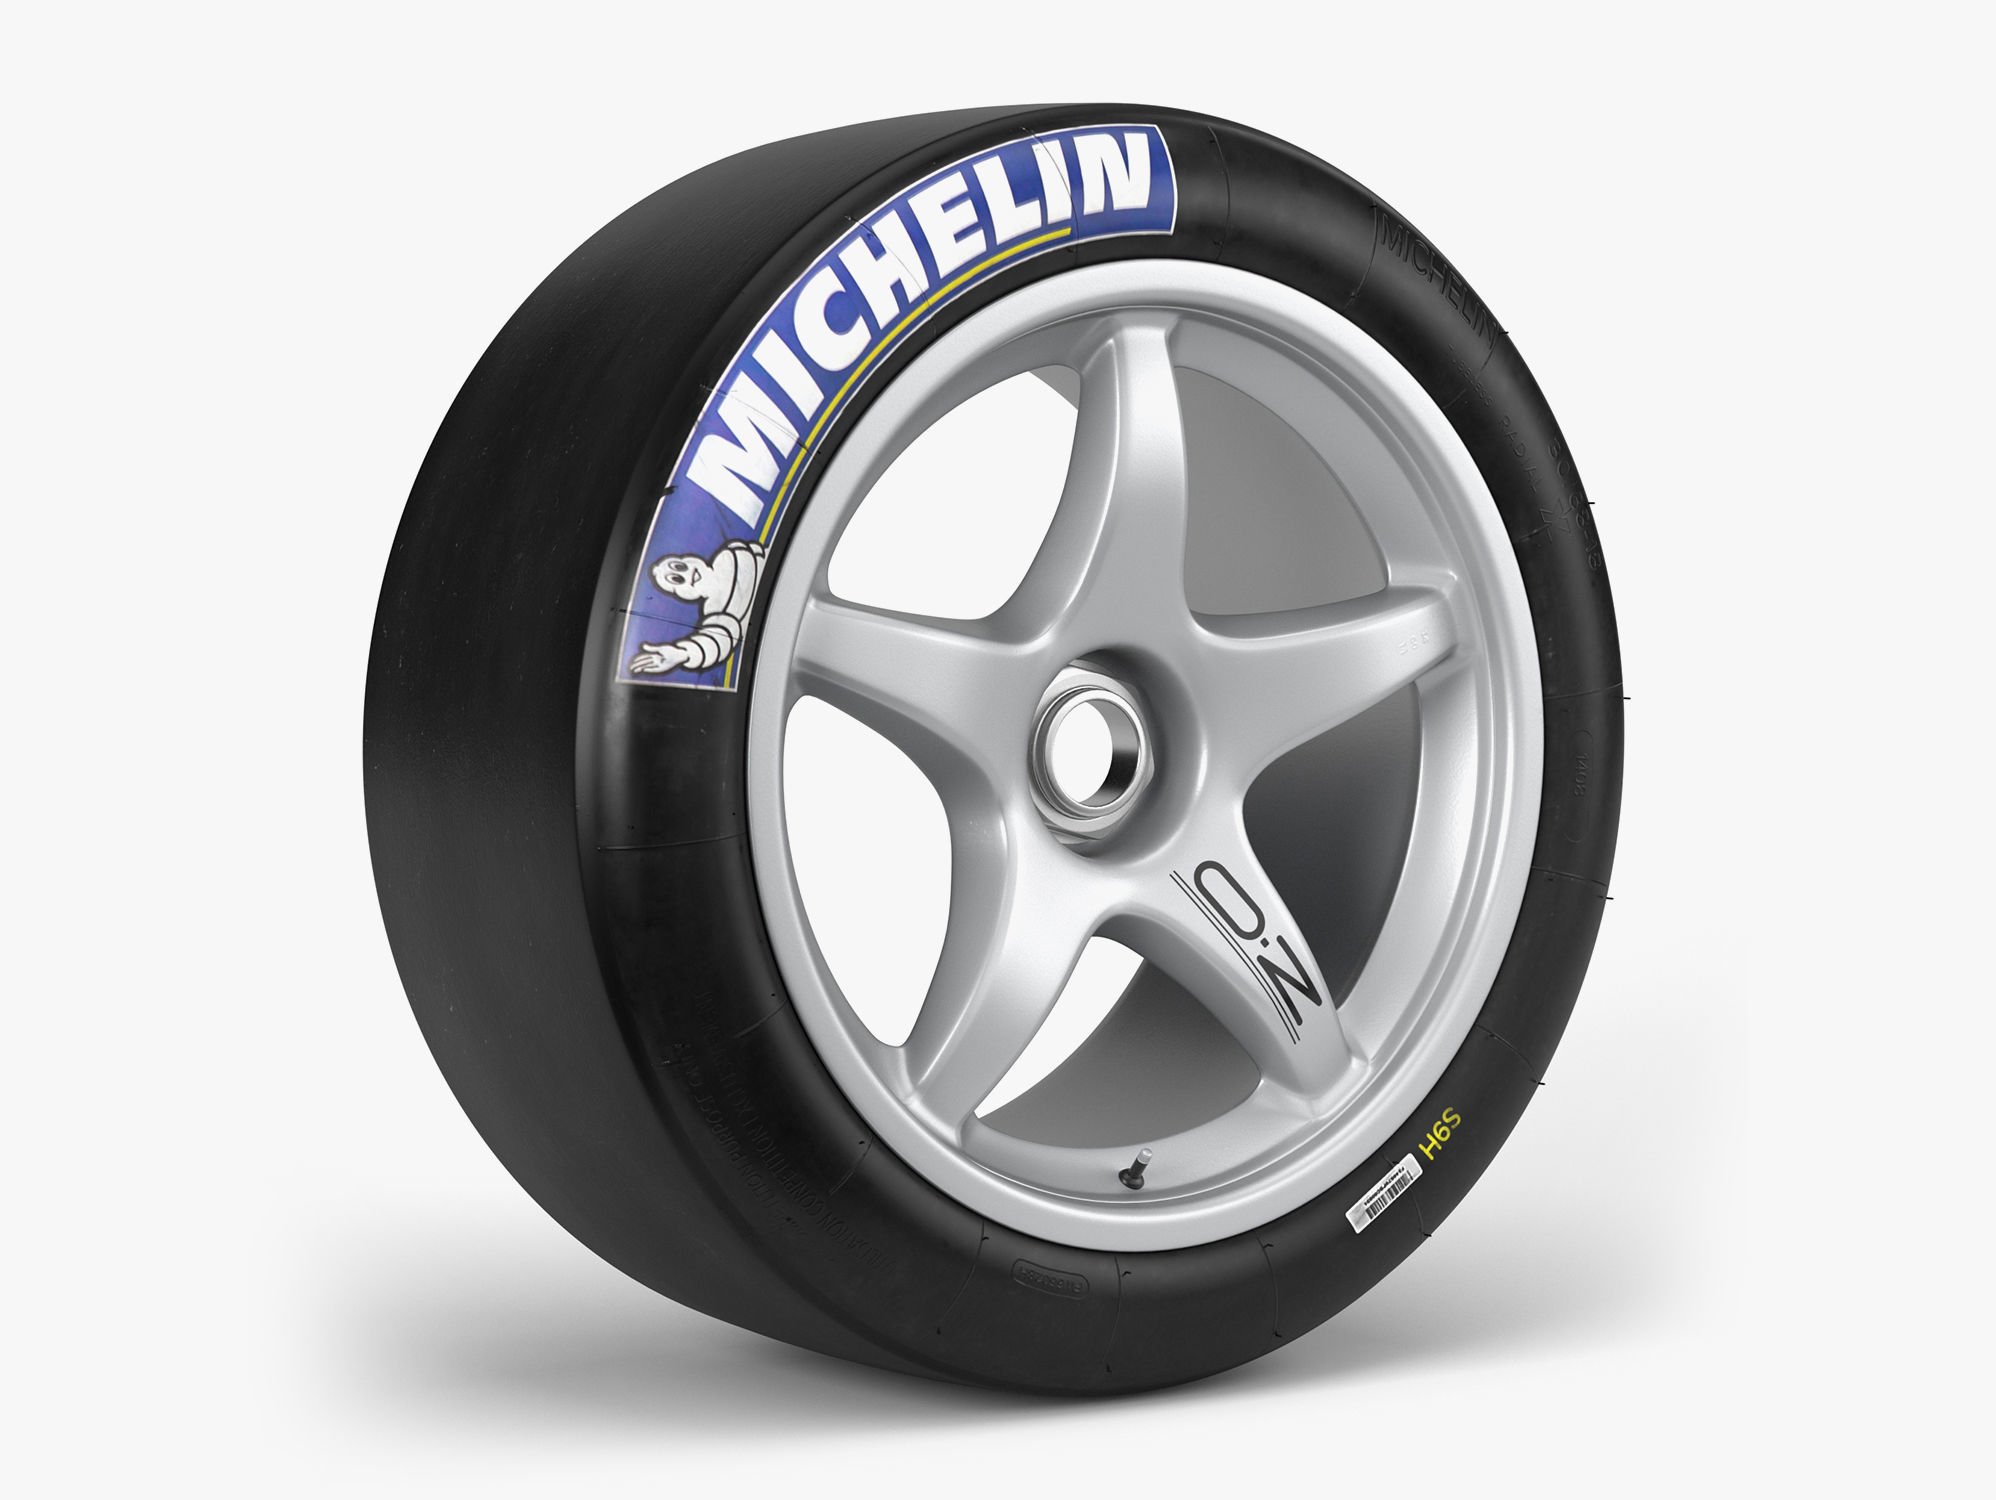 Michelin OZ Racing Combo